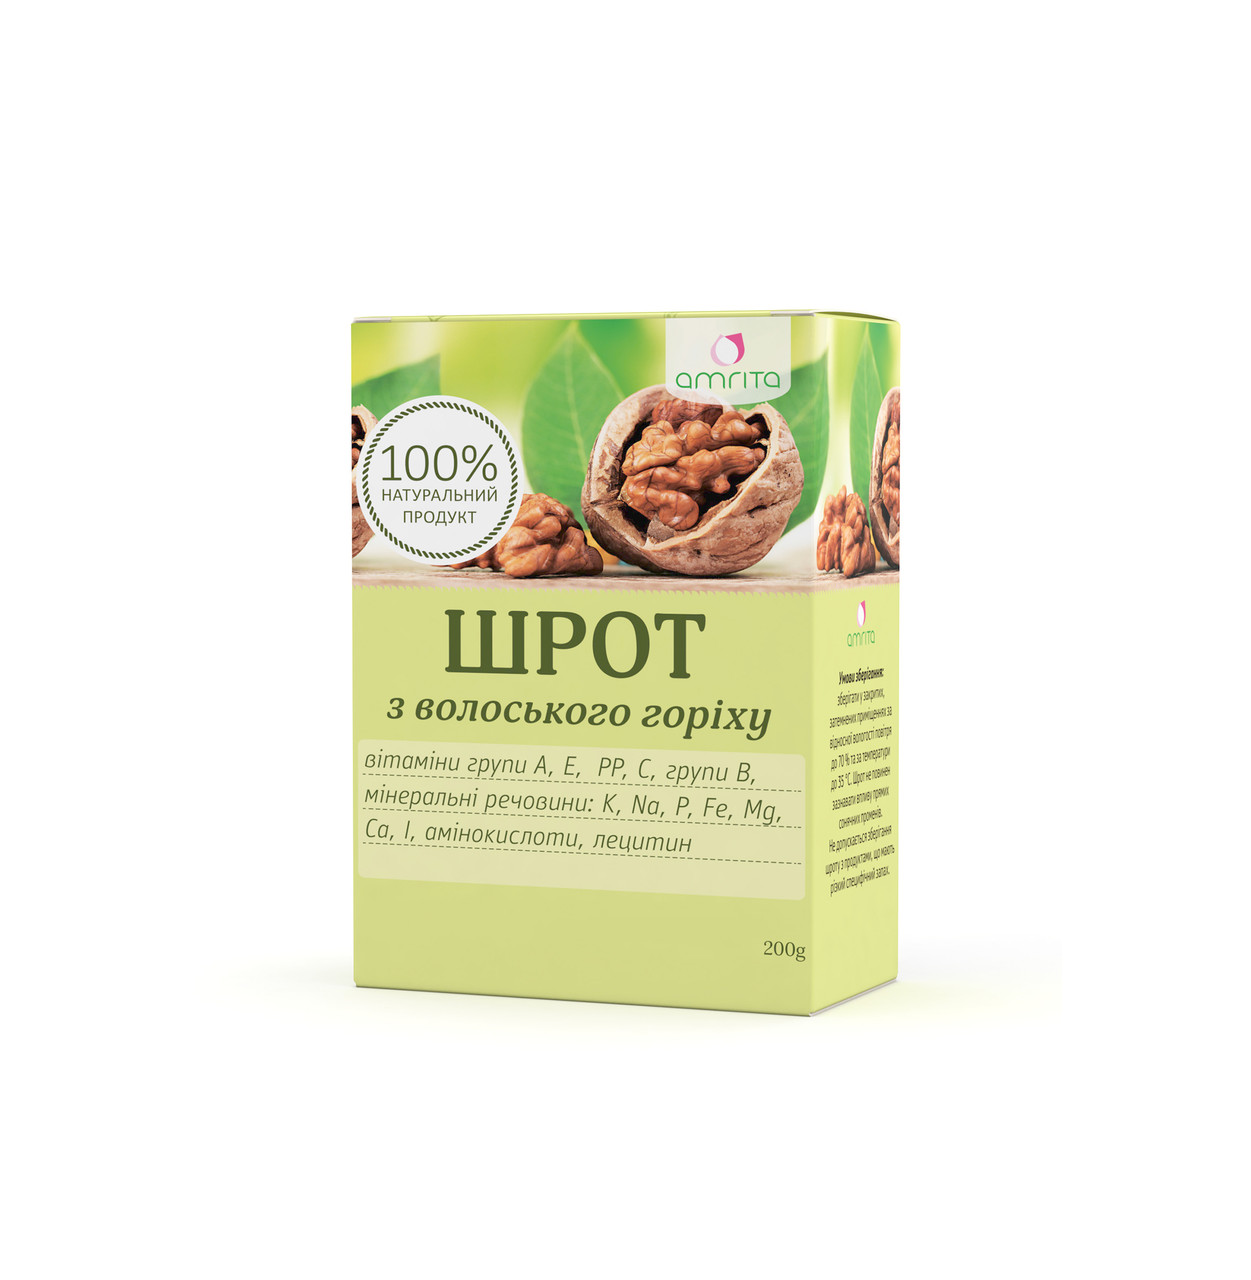 Шрот грецкого ореха 200 г. Источник лецитина,витаминов А, В, С, Е, Р и микроэлементов.